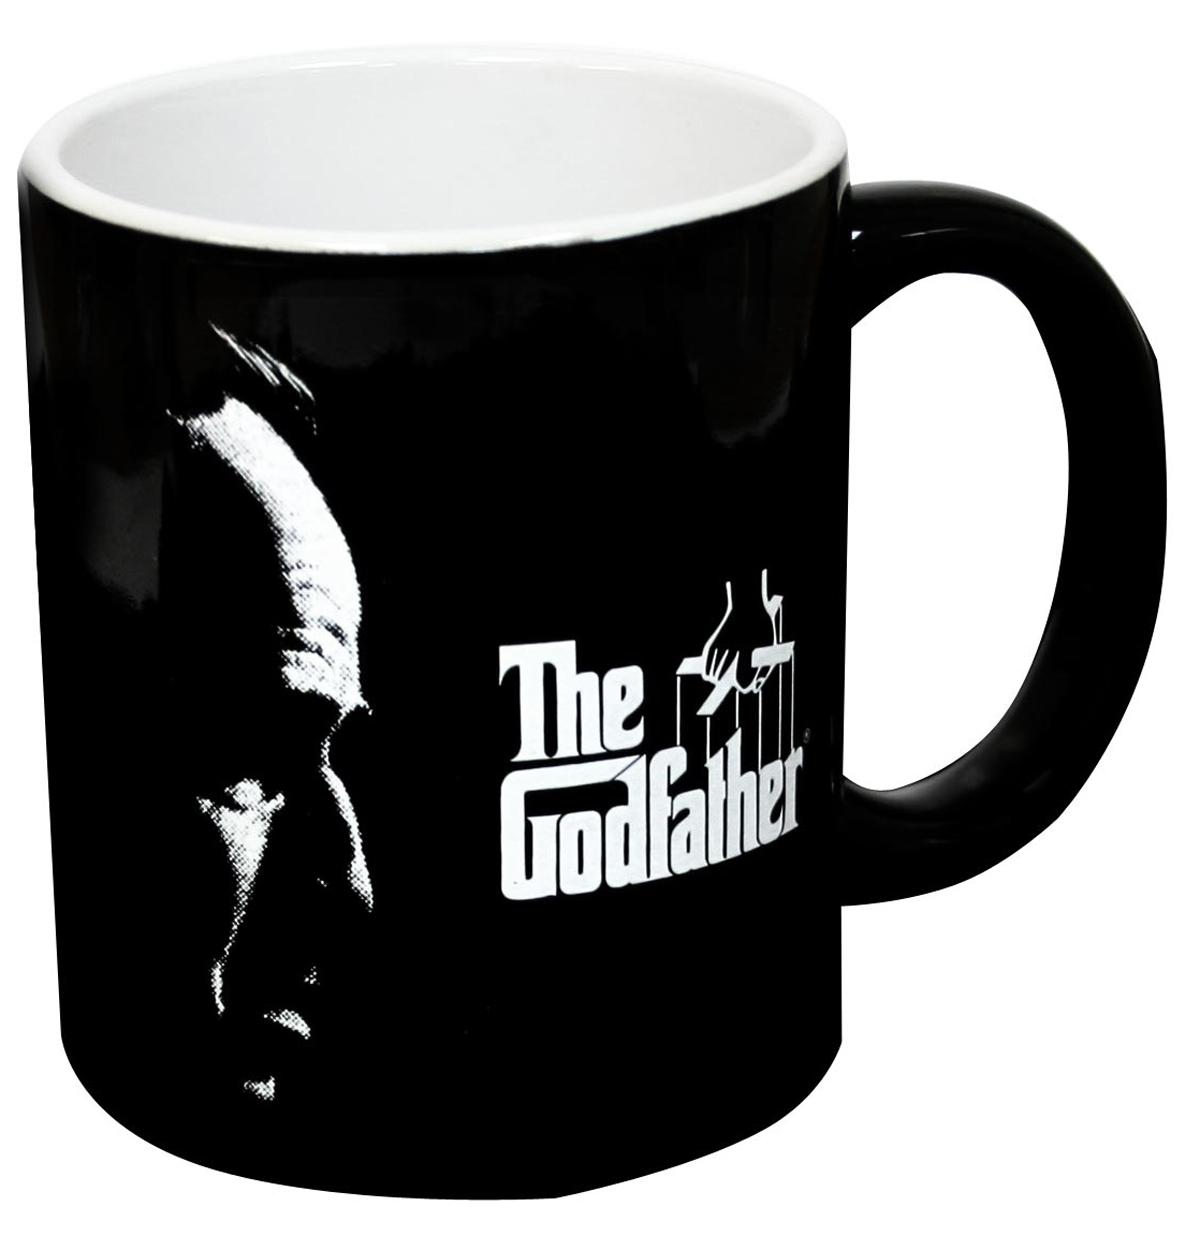 Godfather Don Vito 12oz Mug